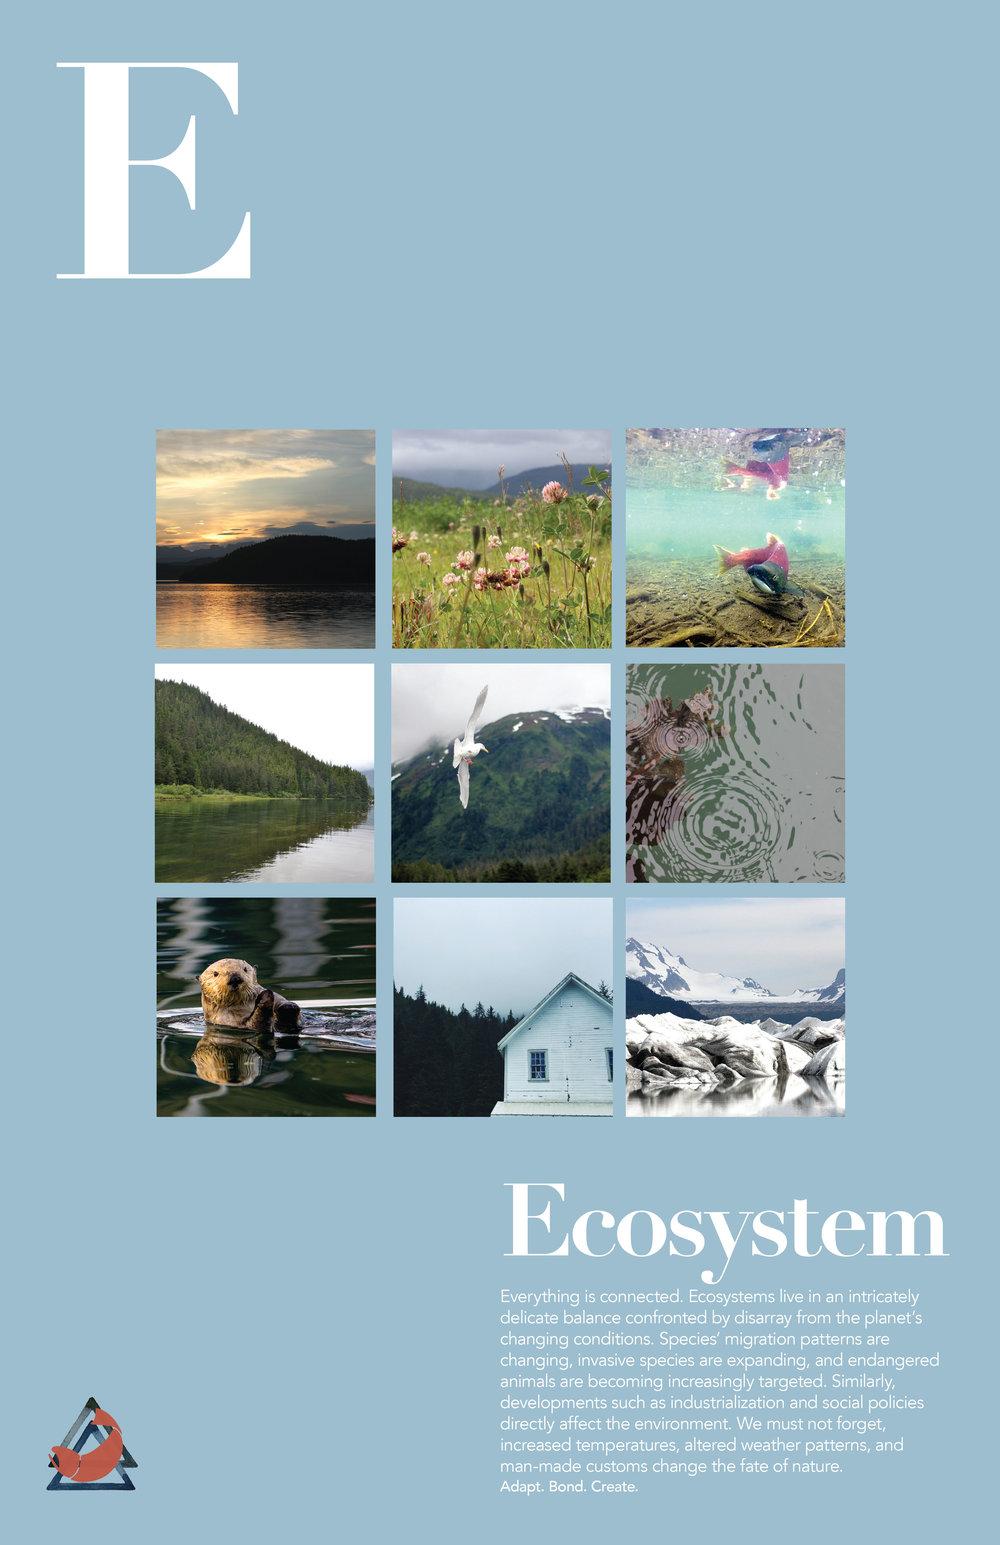 ecosystem_final copy.jpg